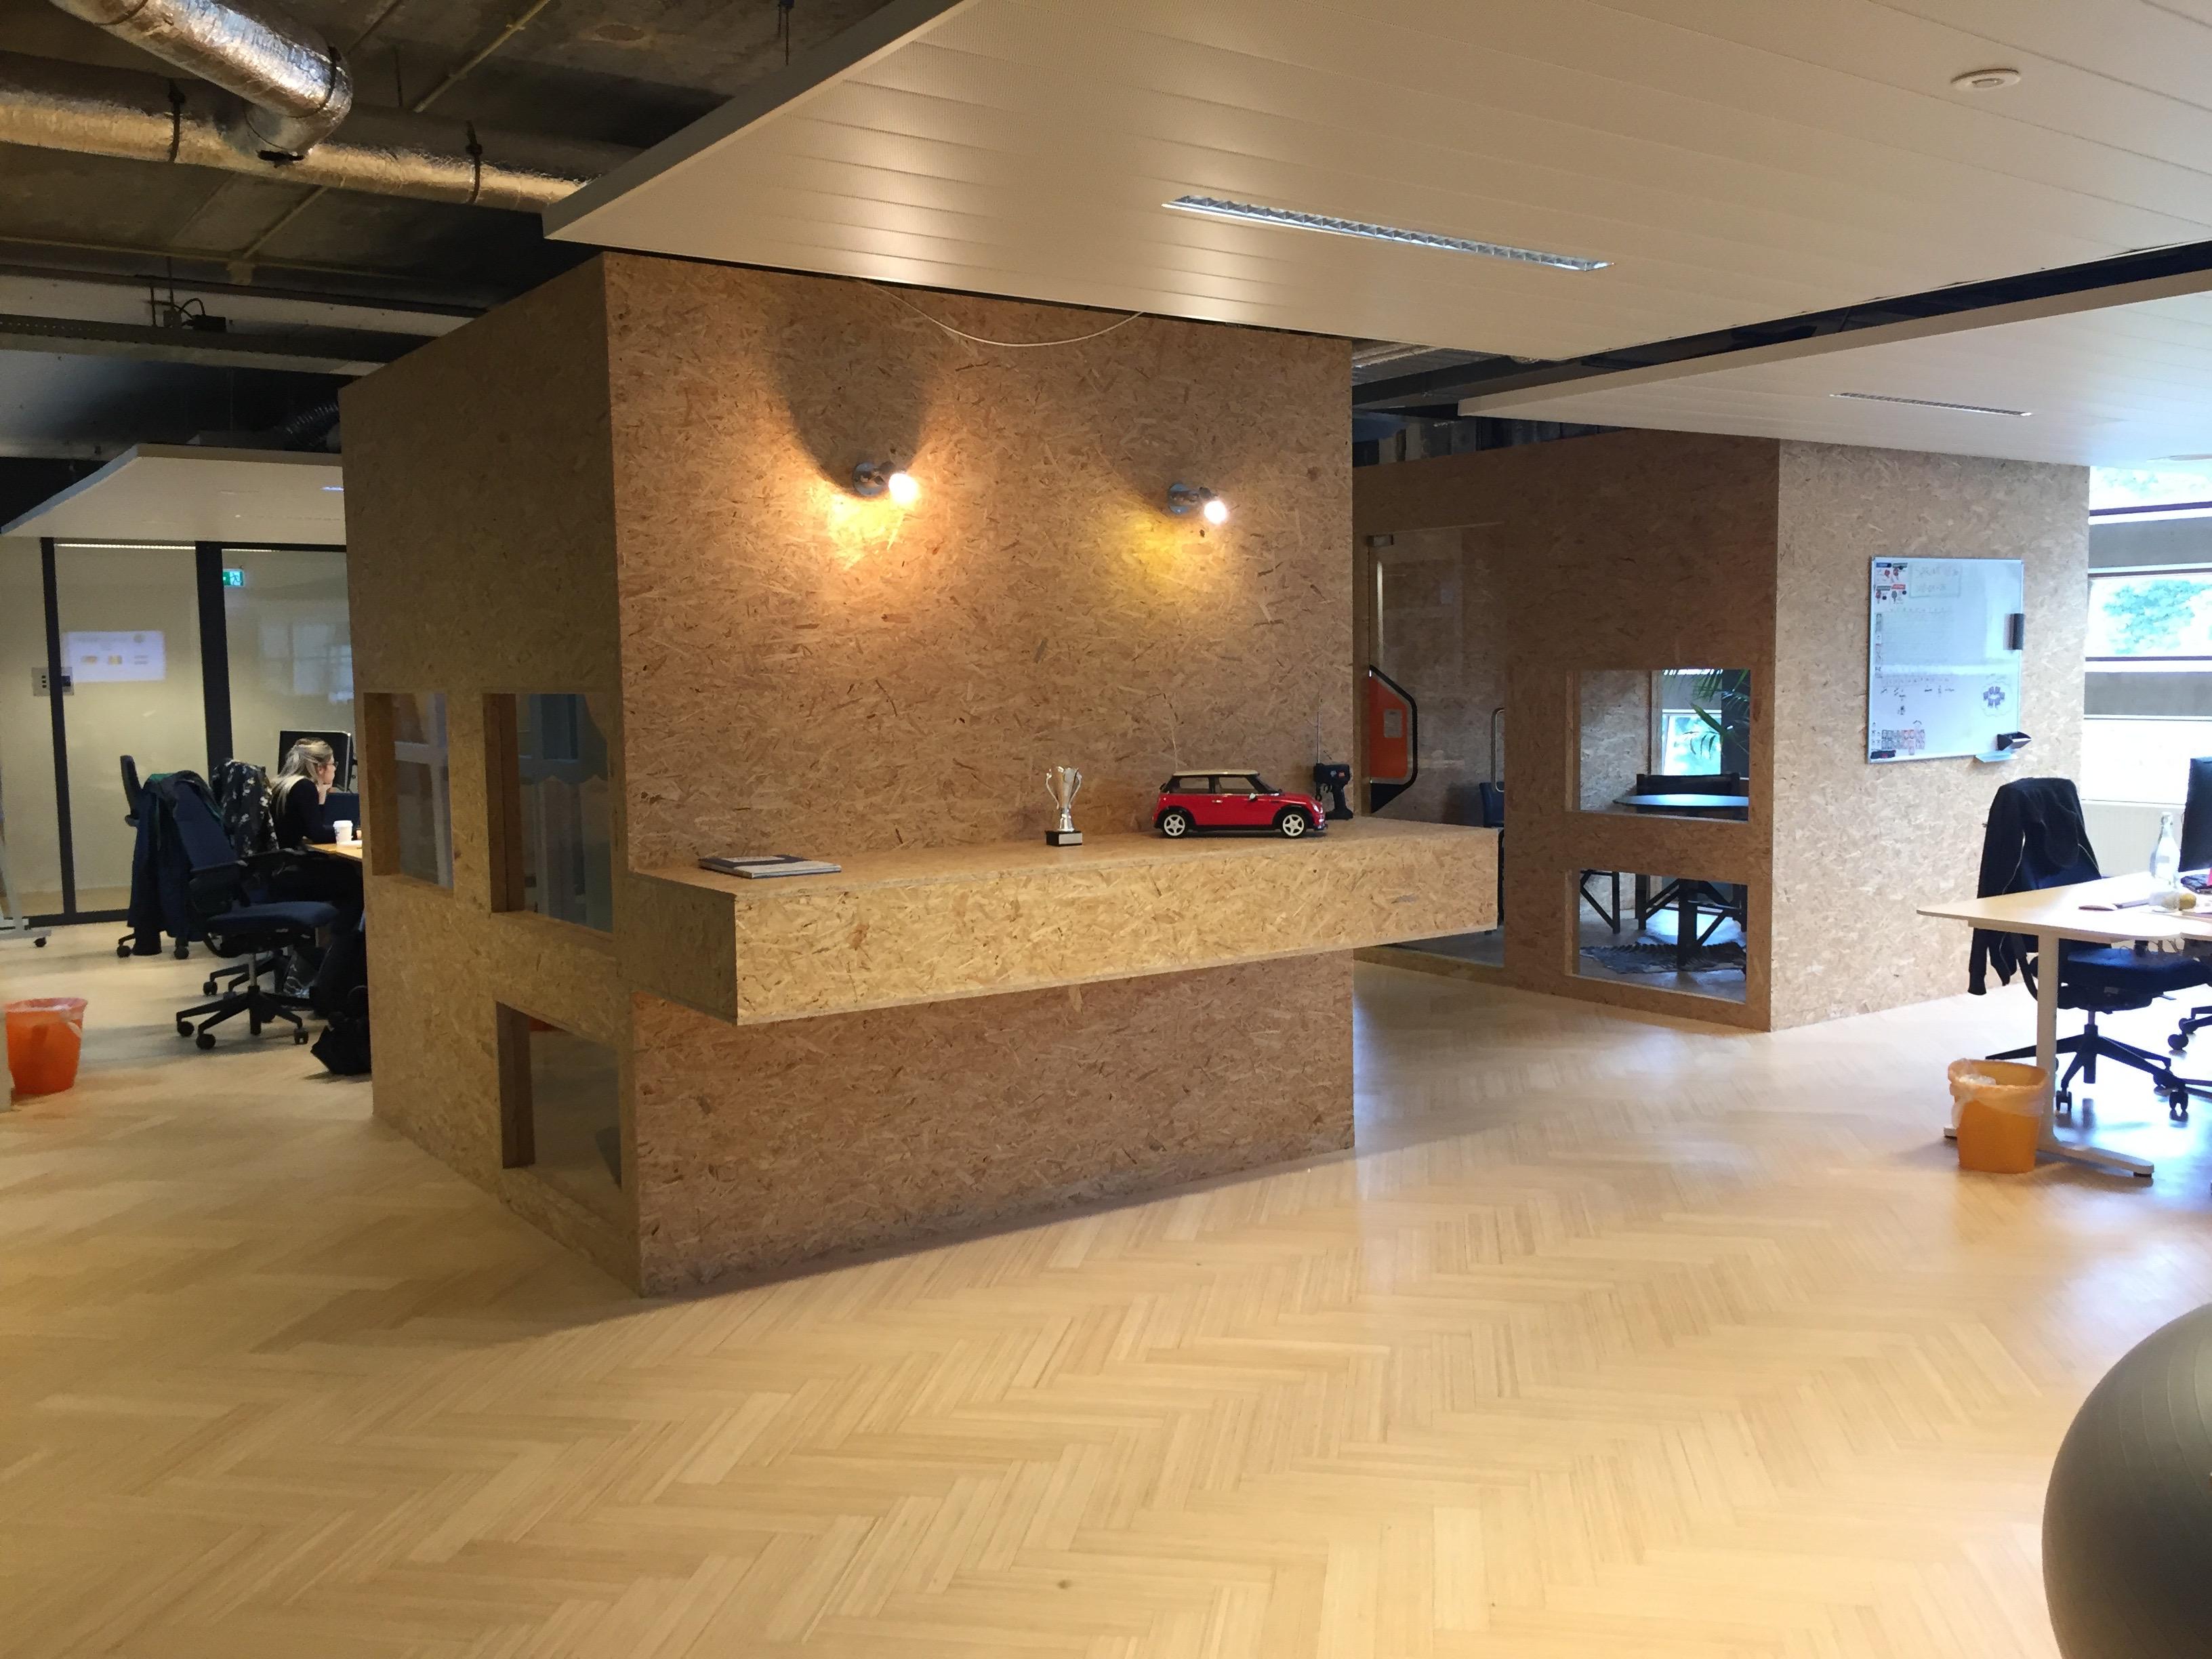 <p>Meetingrooms foto: HotelSpecials</p>